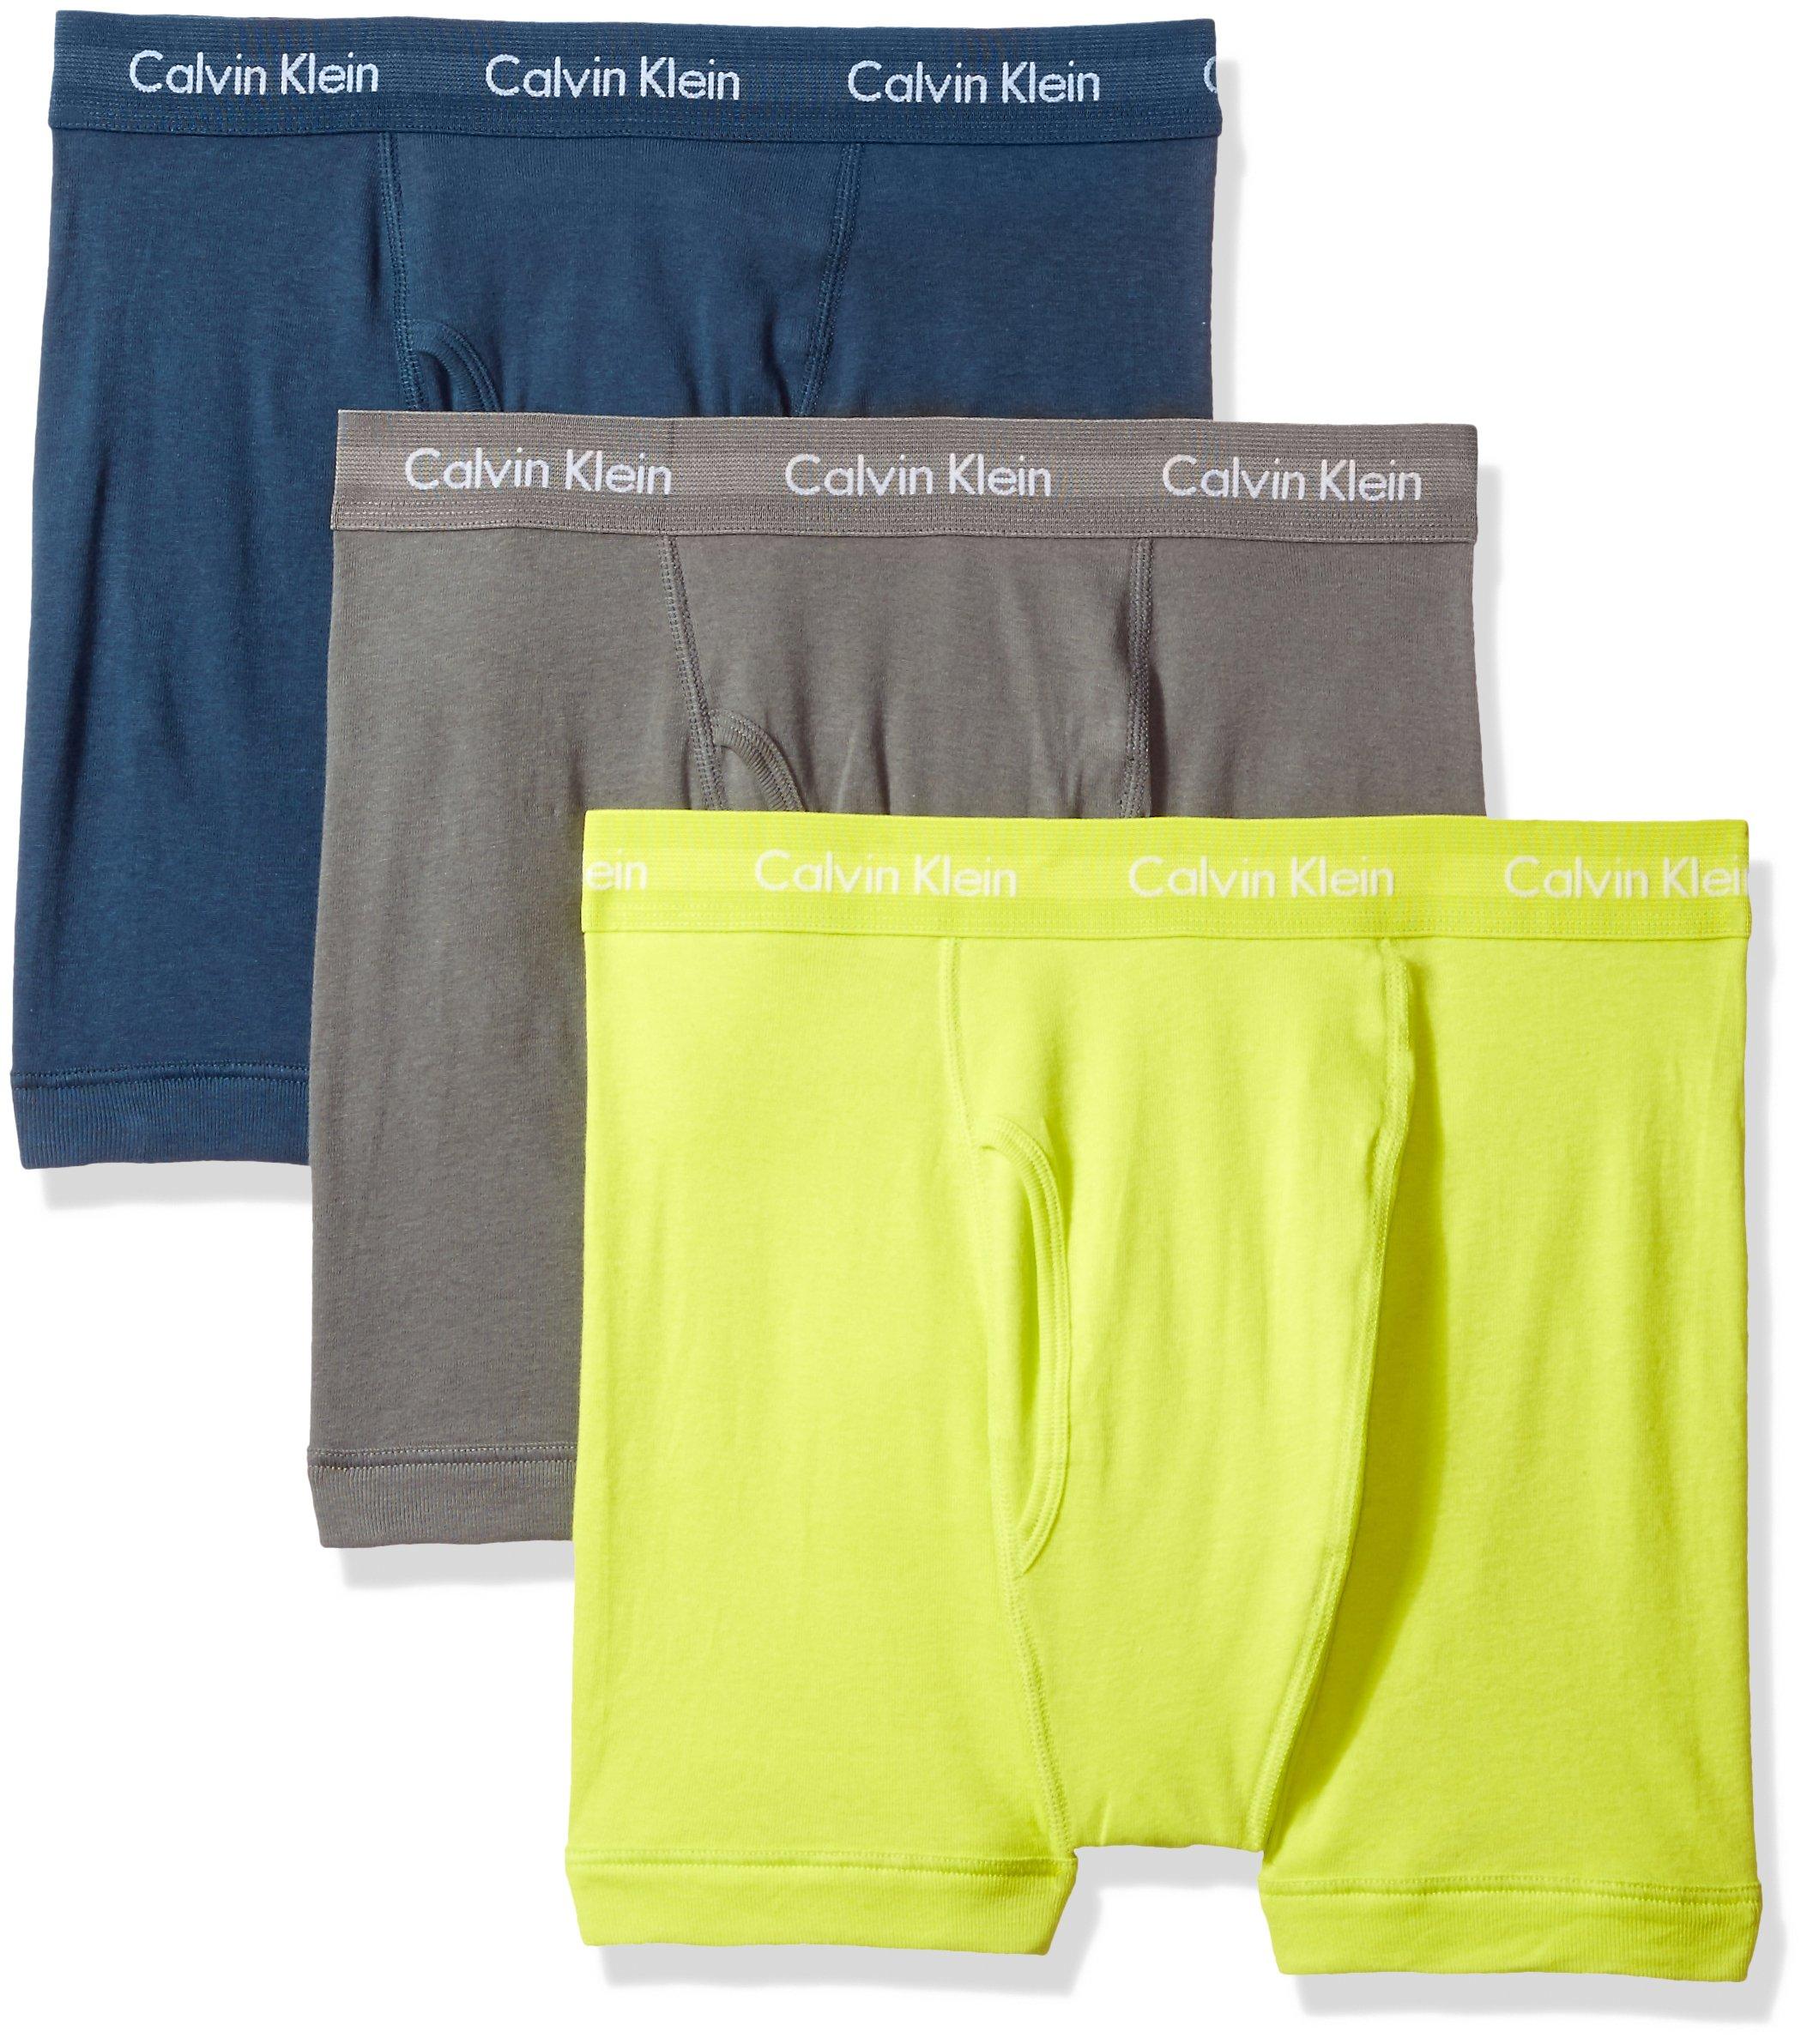 Calvin Klein Men's Underwear Cotton Classics Boxer Briefs (Pack of 3), Grey Sky/Rebel/Intuition, Small by Calvin Klein